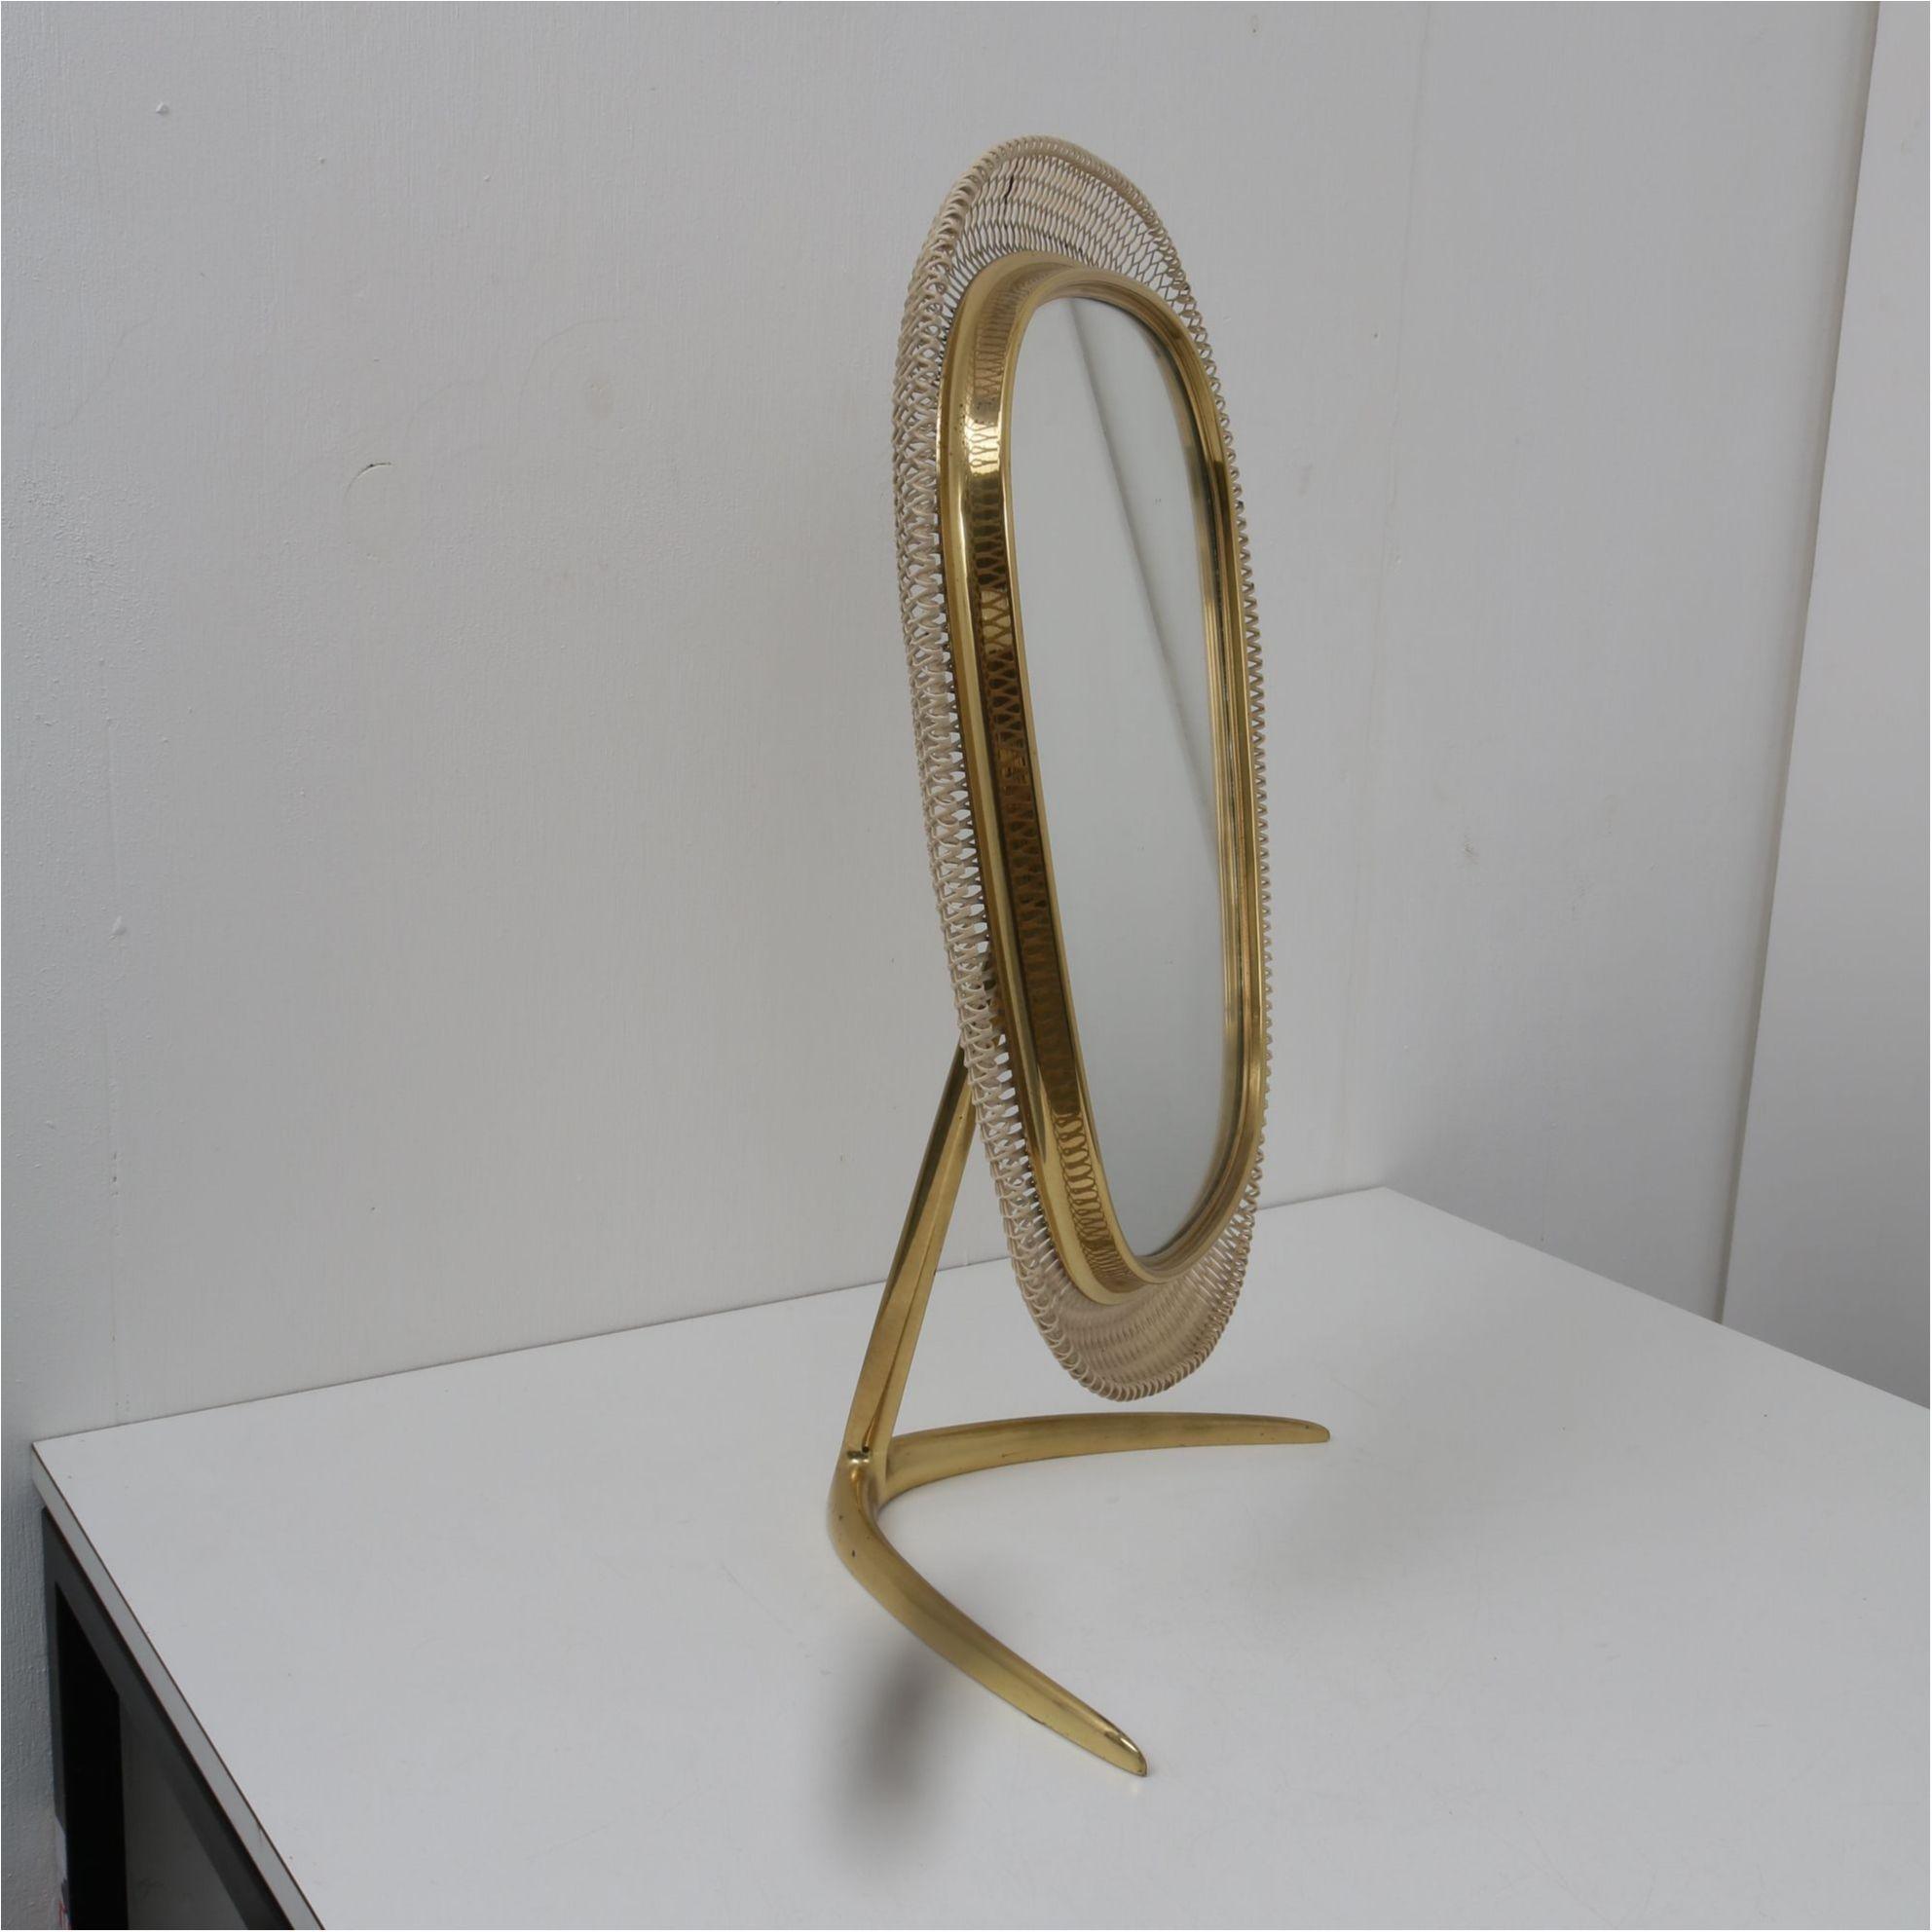 Brass Vanity Mirror Germany 1950